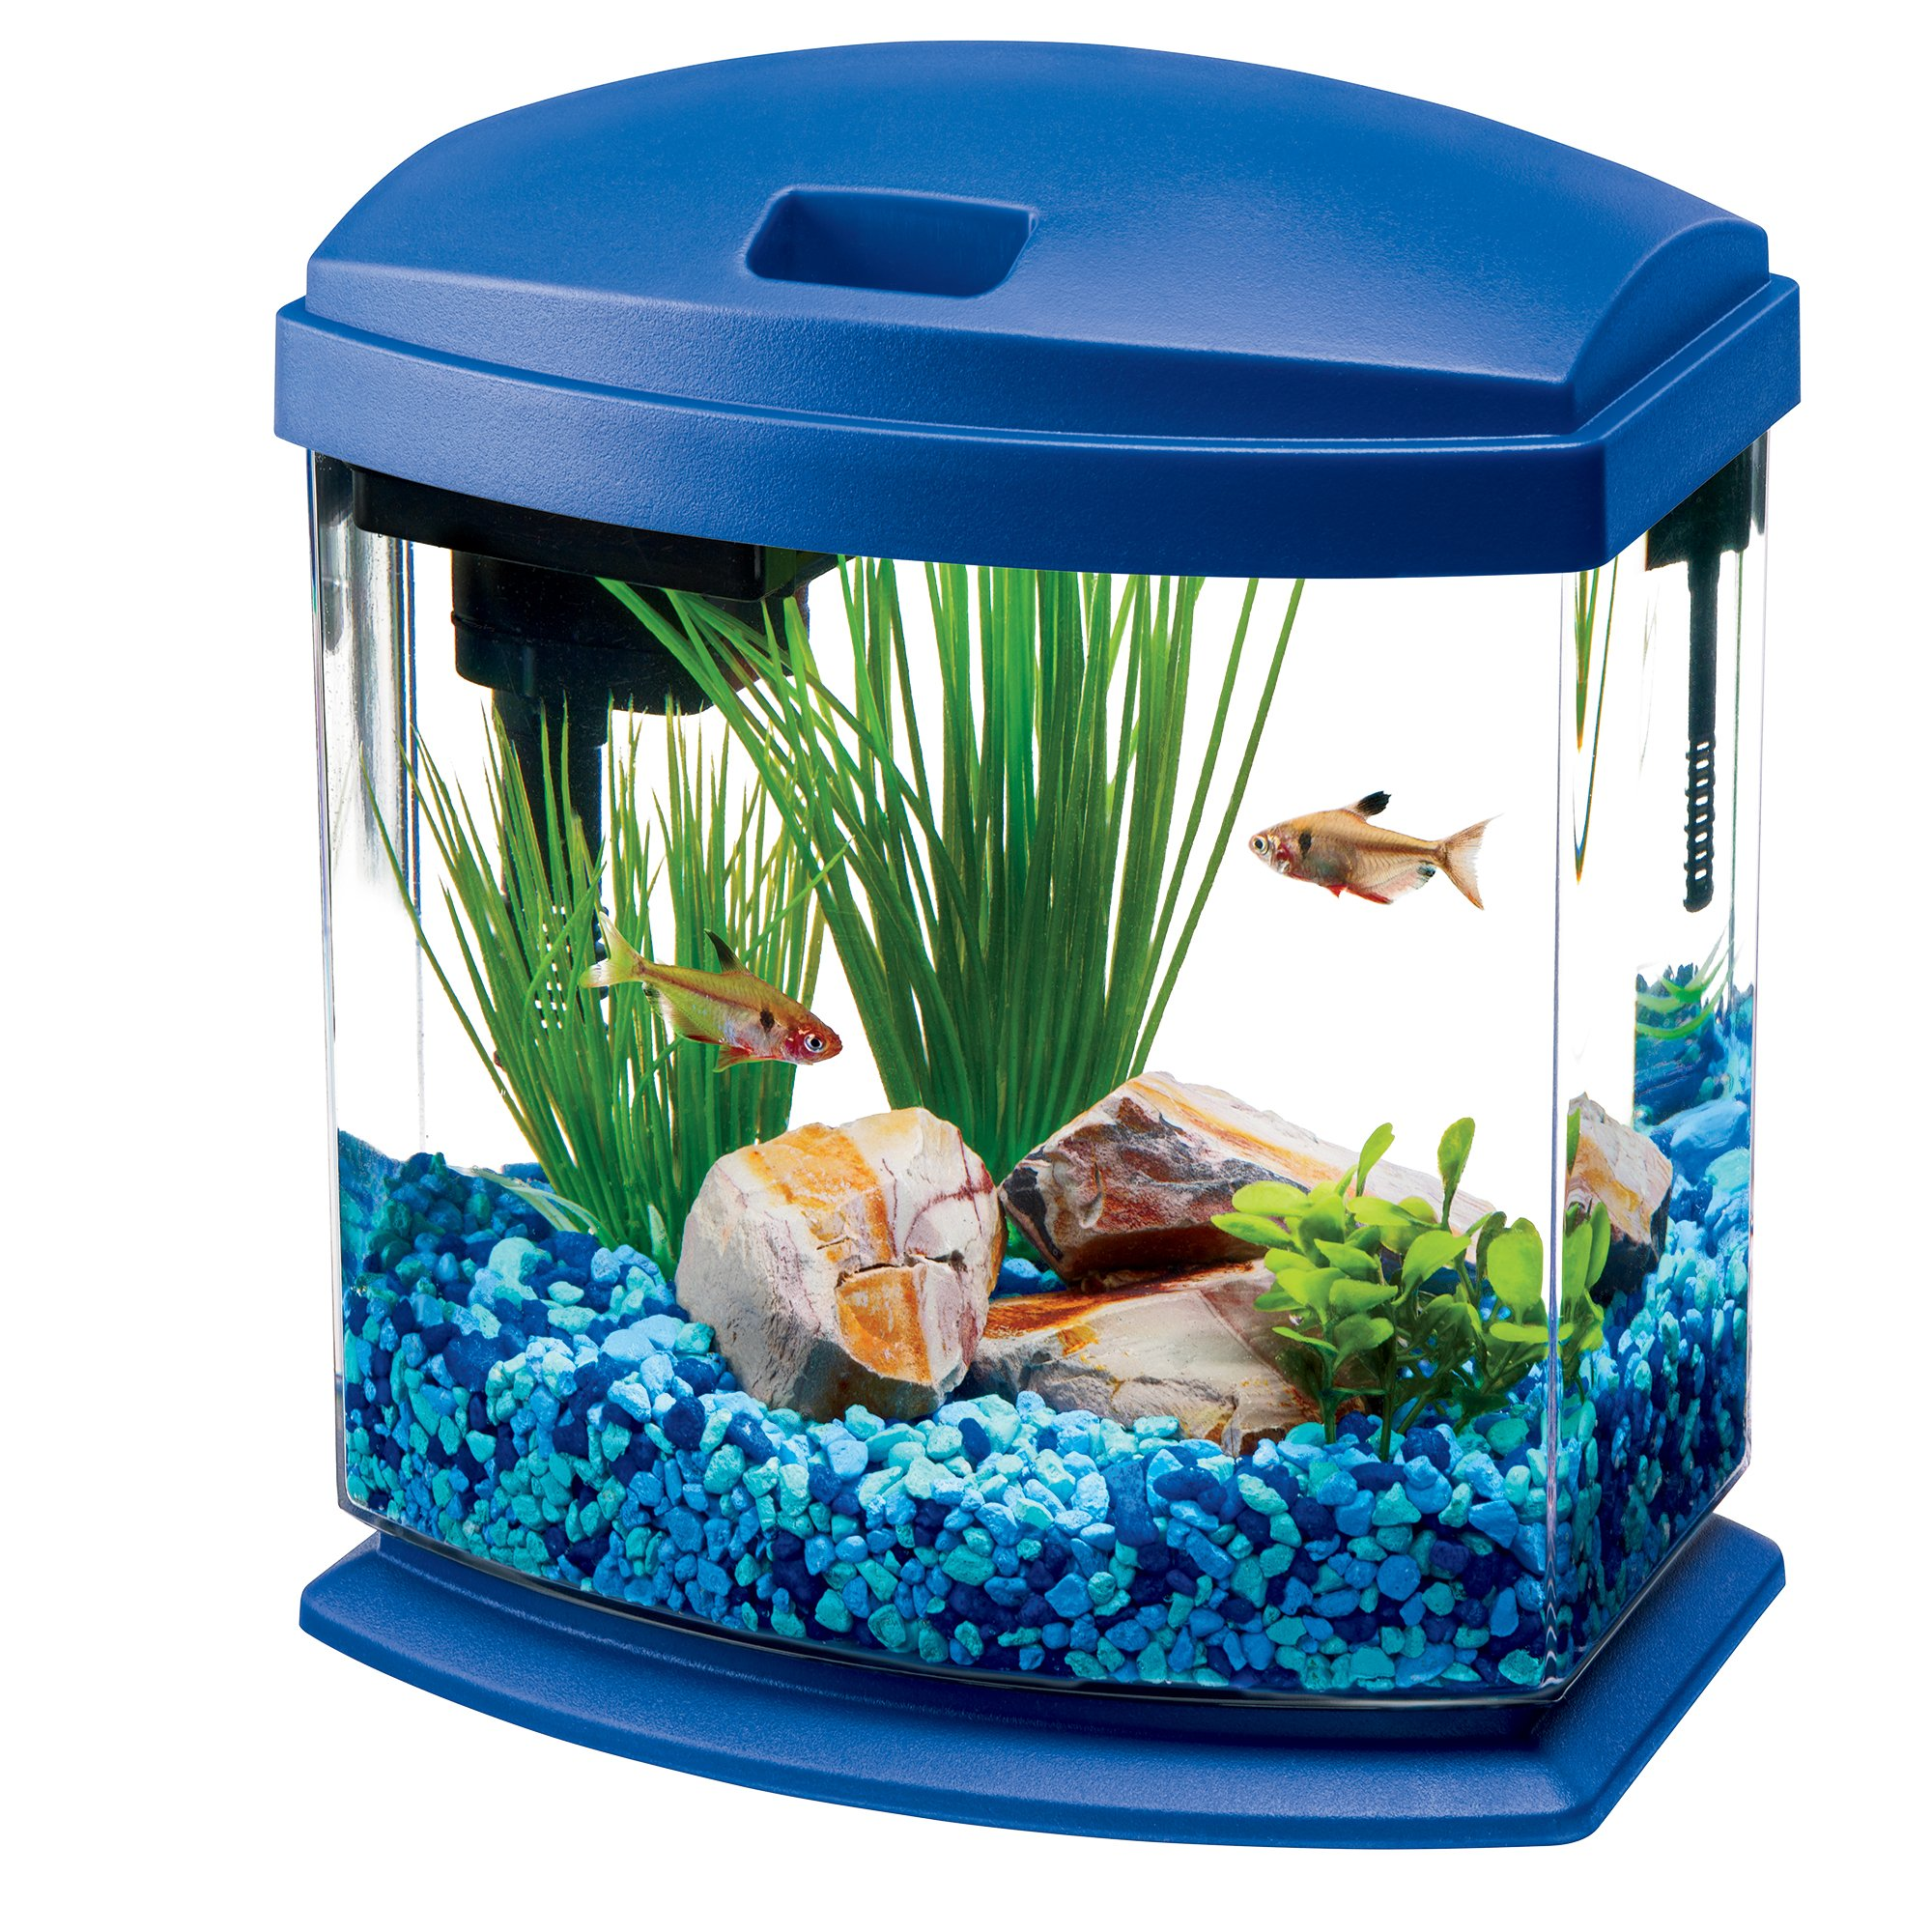 Using Shop Lights For Aquarium: Aqueon LED MiniBow Aquarium Starter Kits With LED Lighting